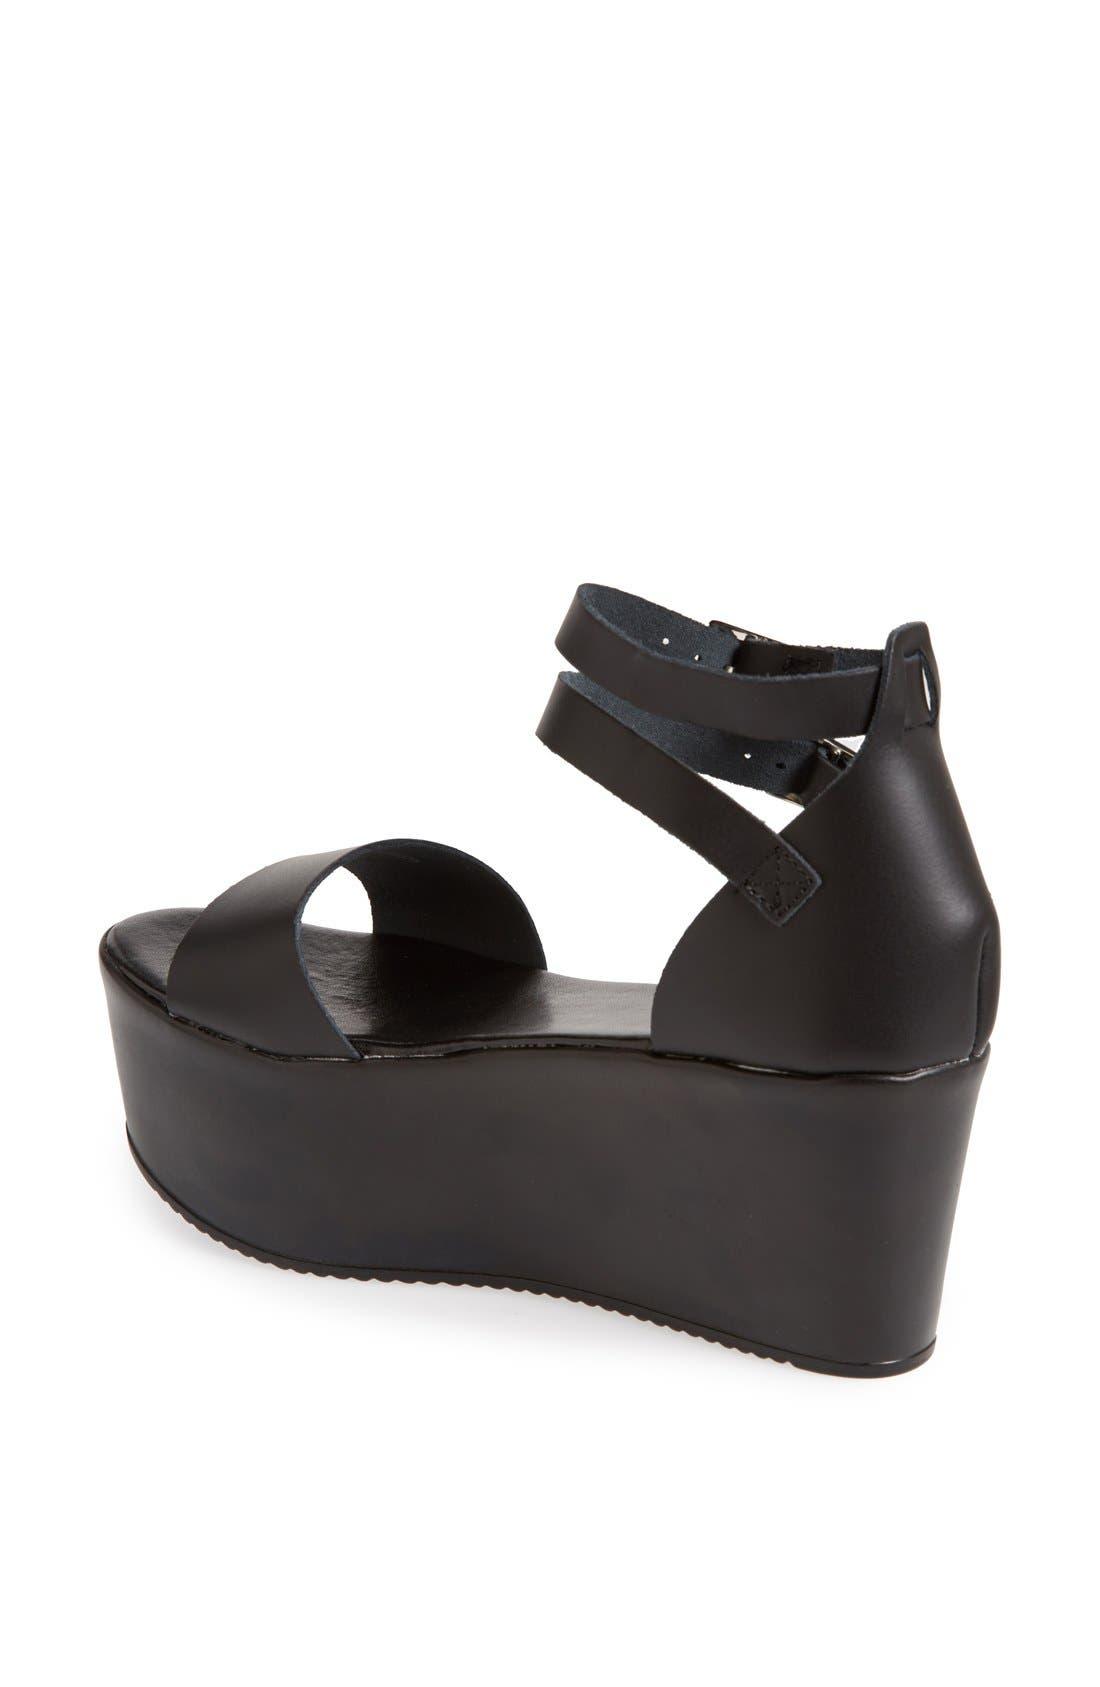 TOPSHOP, 'Wallis' Ankle Strap Platform Sandal, Alternate thumbnail 2, color, 001